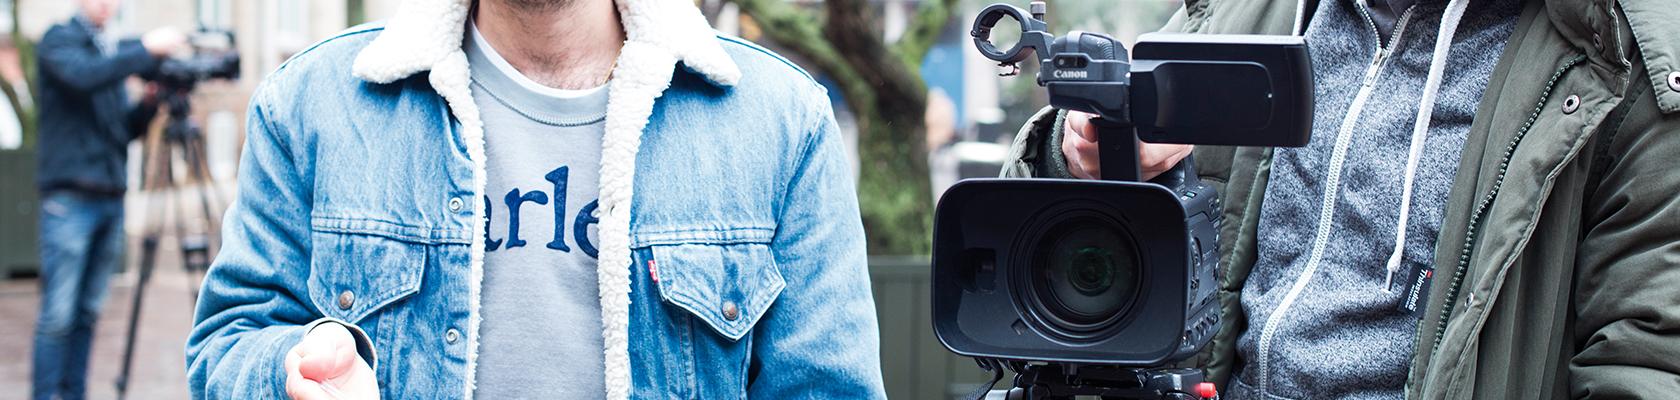 Devenir Journaliste Reporter - Ecole de Journalisme EFJ